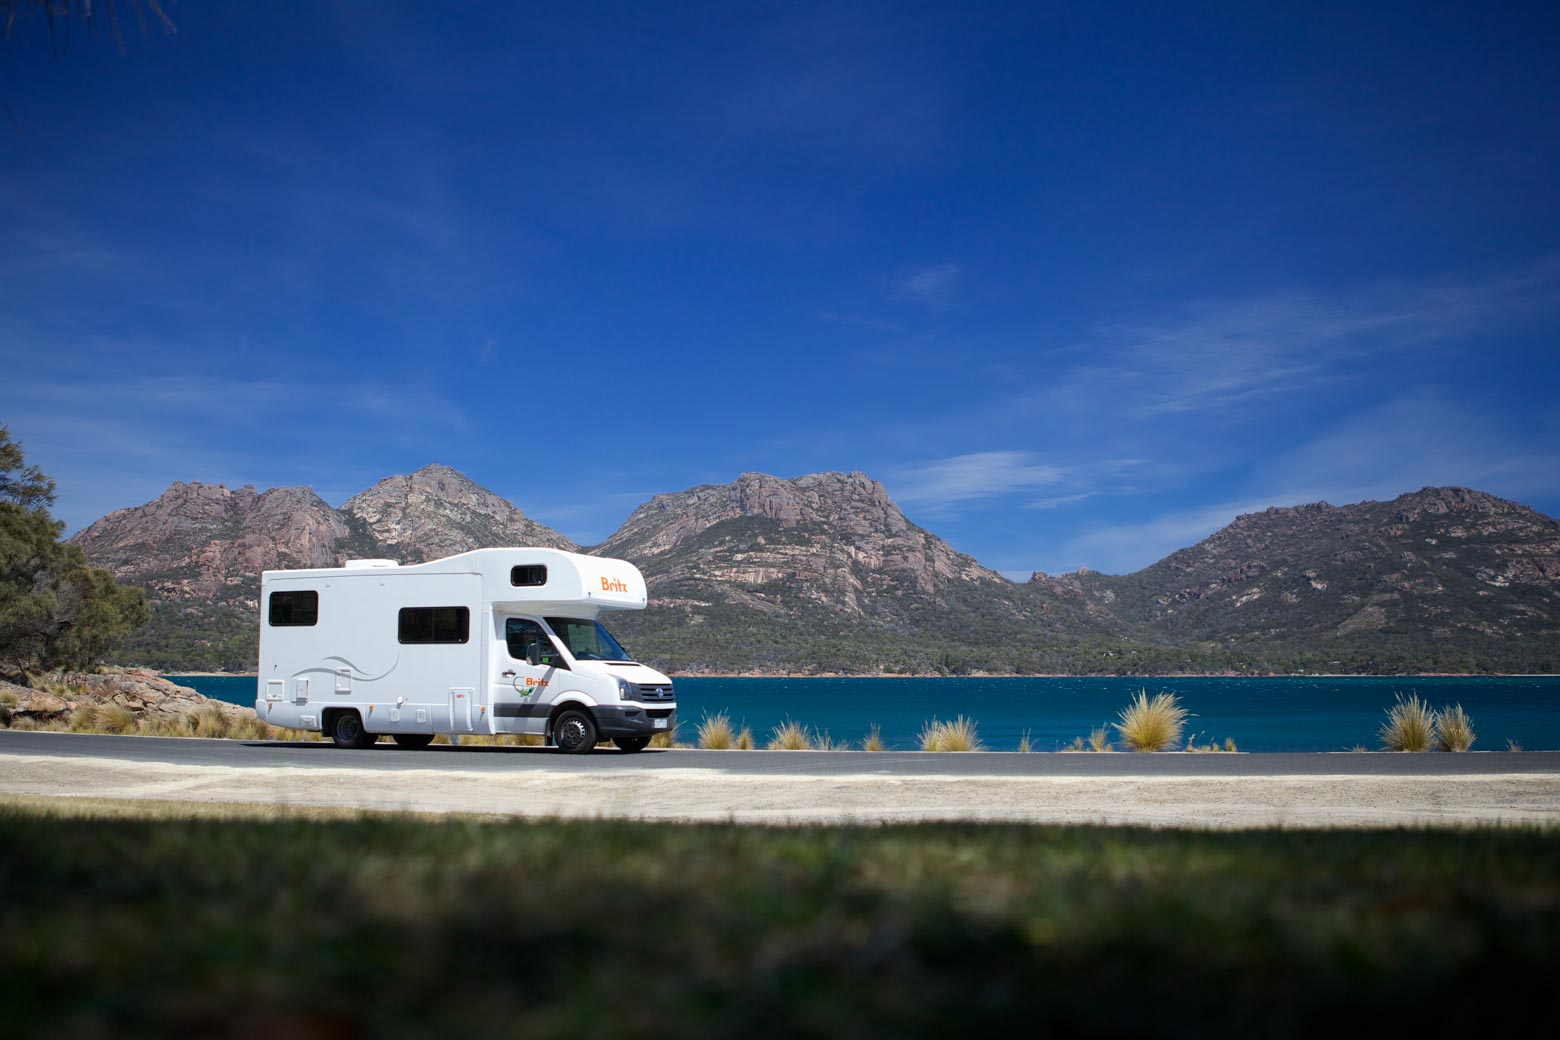 Tasmania campervan hire on your Lap of Tasmania road trip